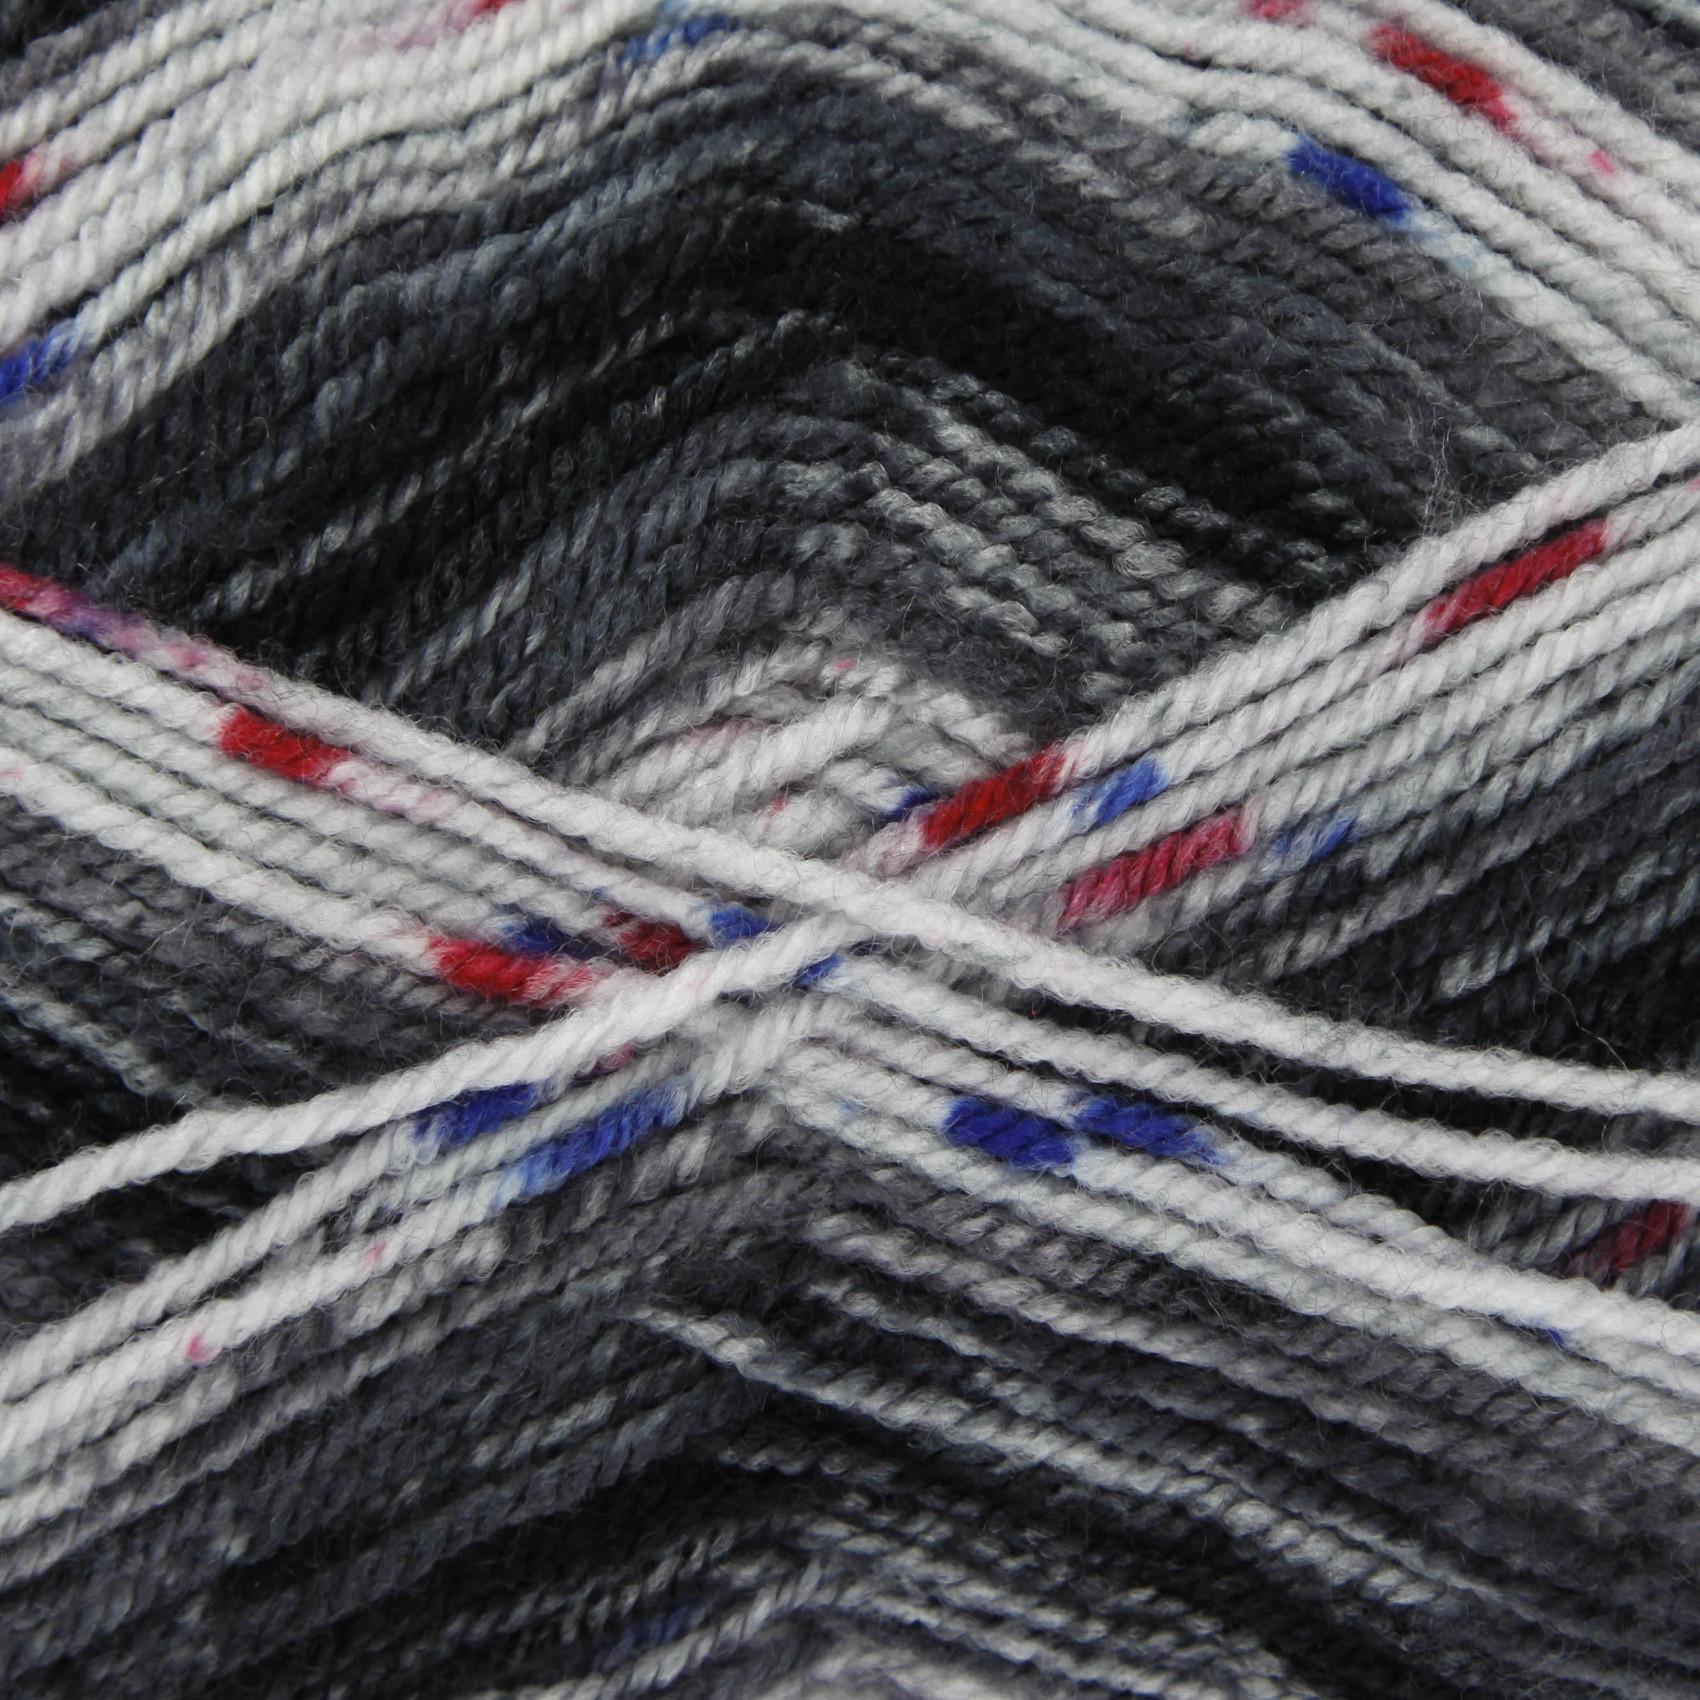 Knitting Yarn Design : King cole splash dk acrylic yarn double knit wool g